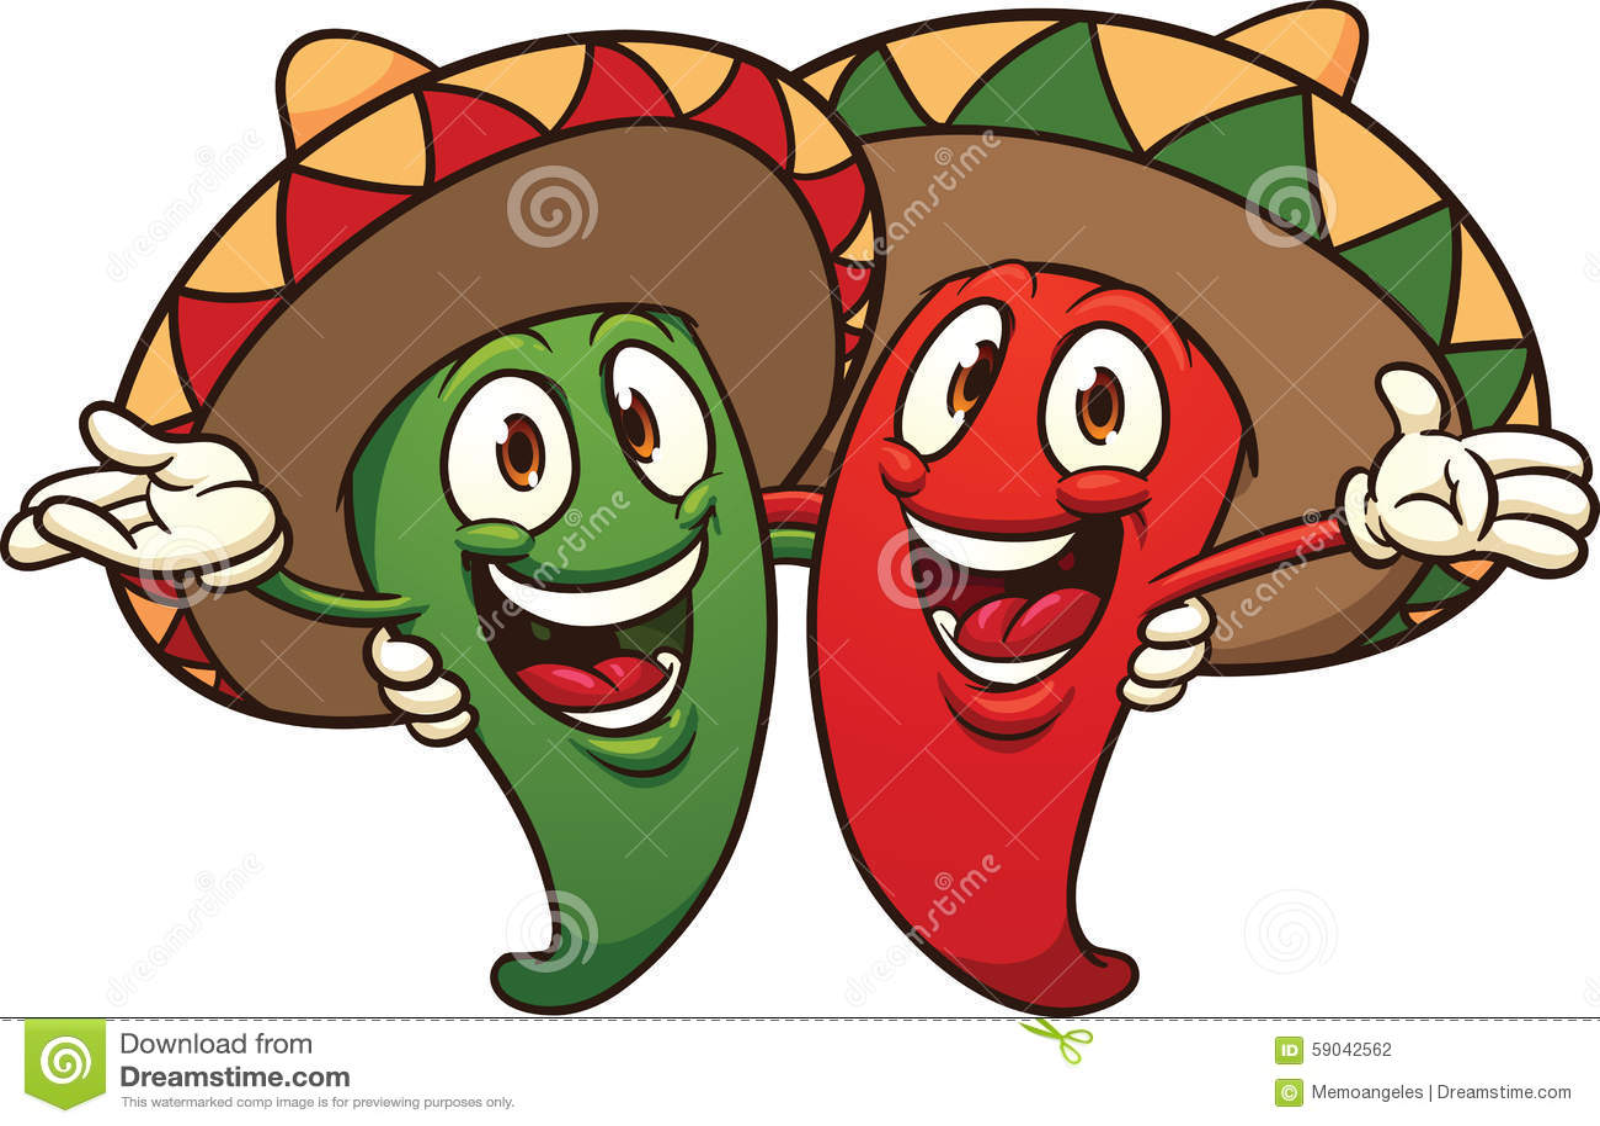 chili peppers wearing sombreros stock vector image cartoon turkey clipart free cartoon thanksgiving turkey clipart